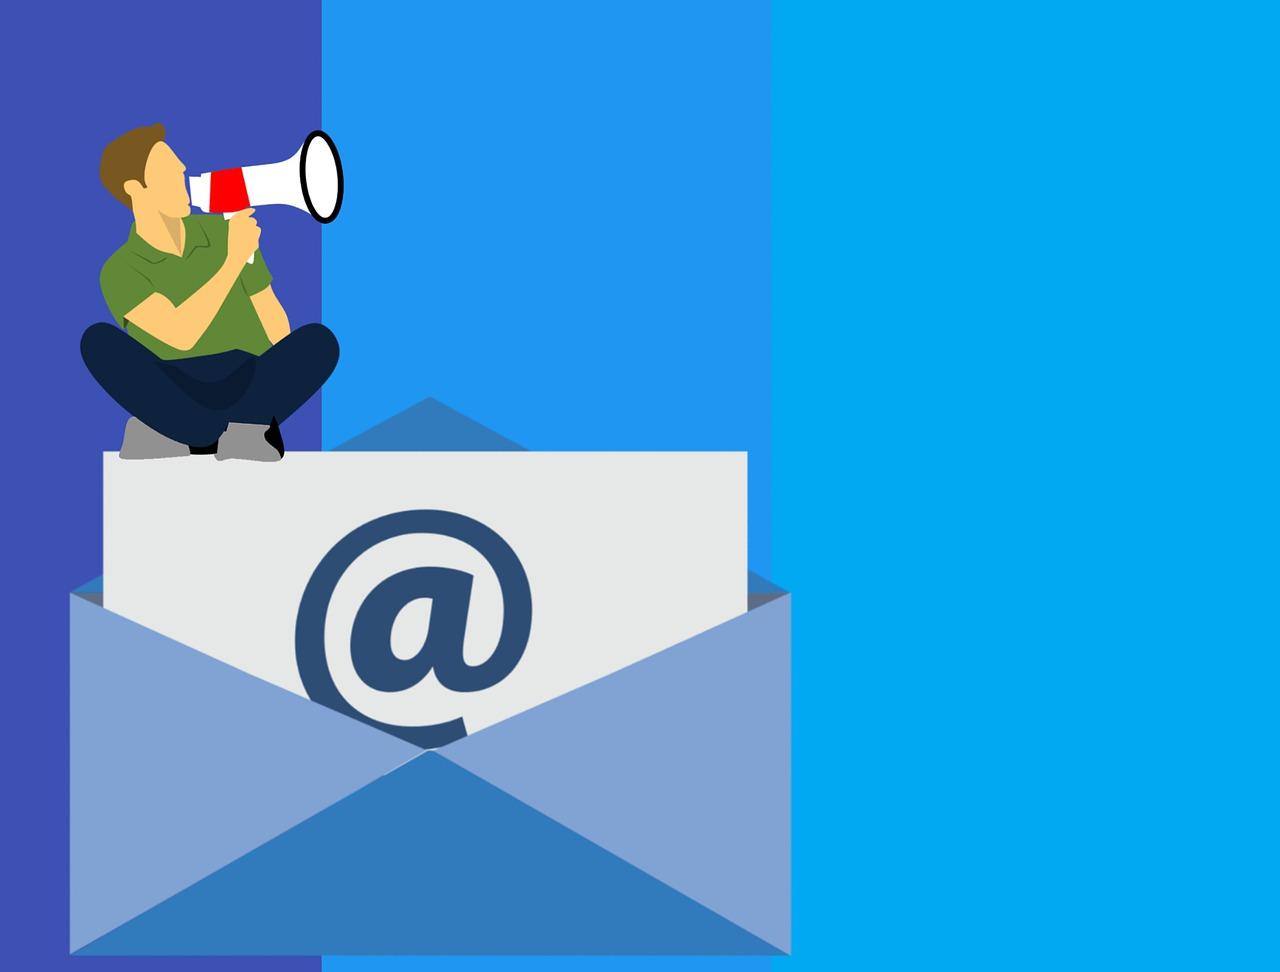 email emana